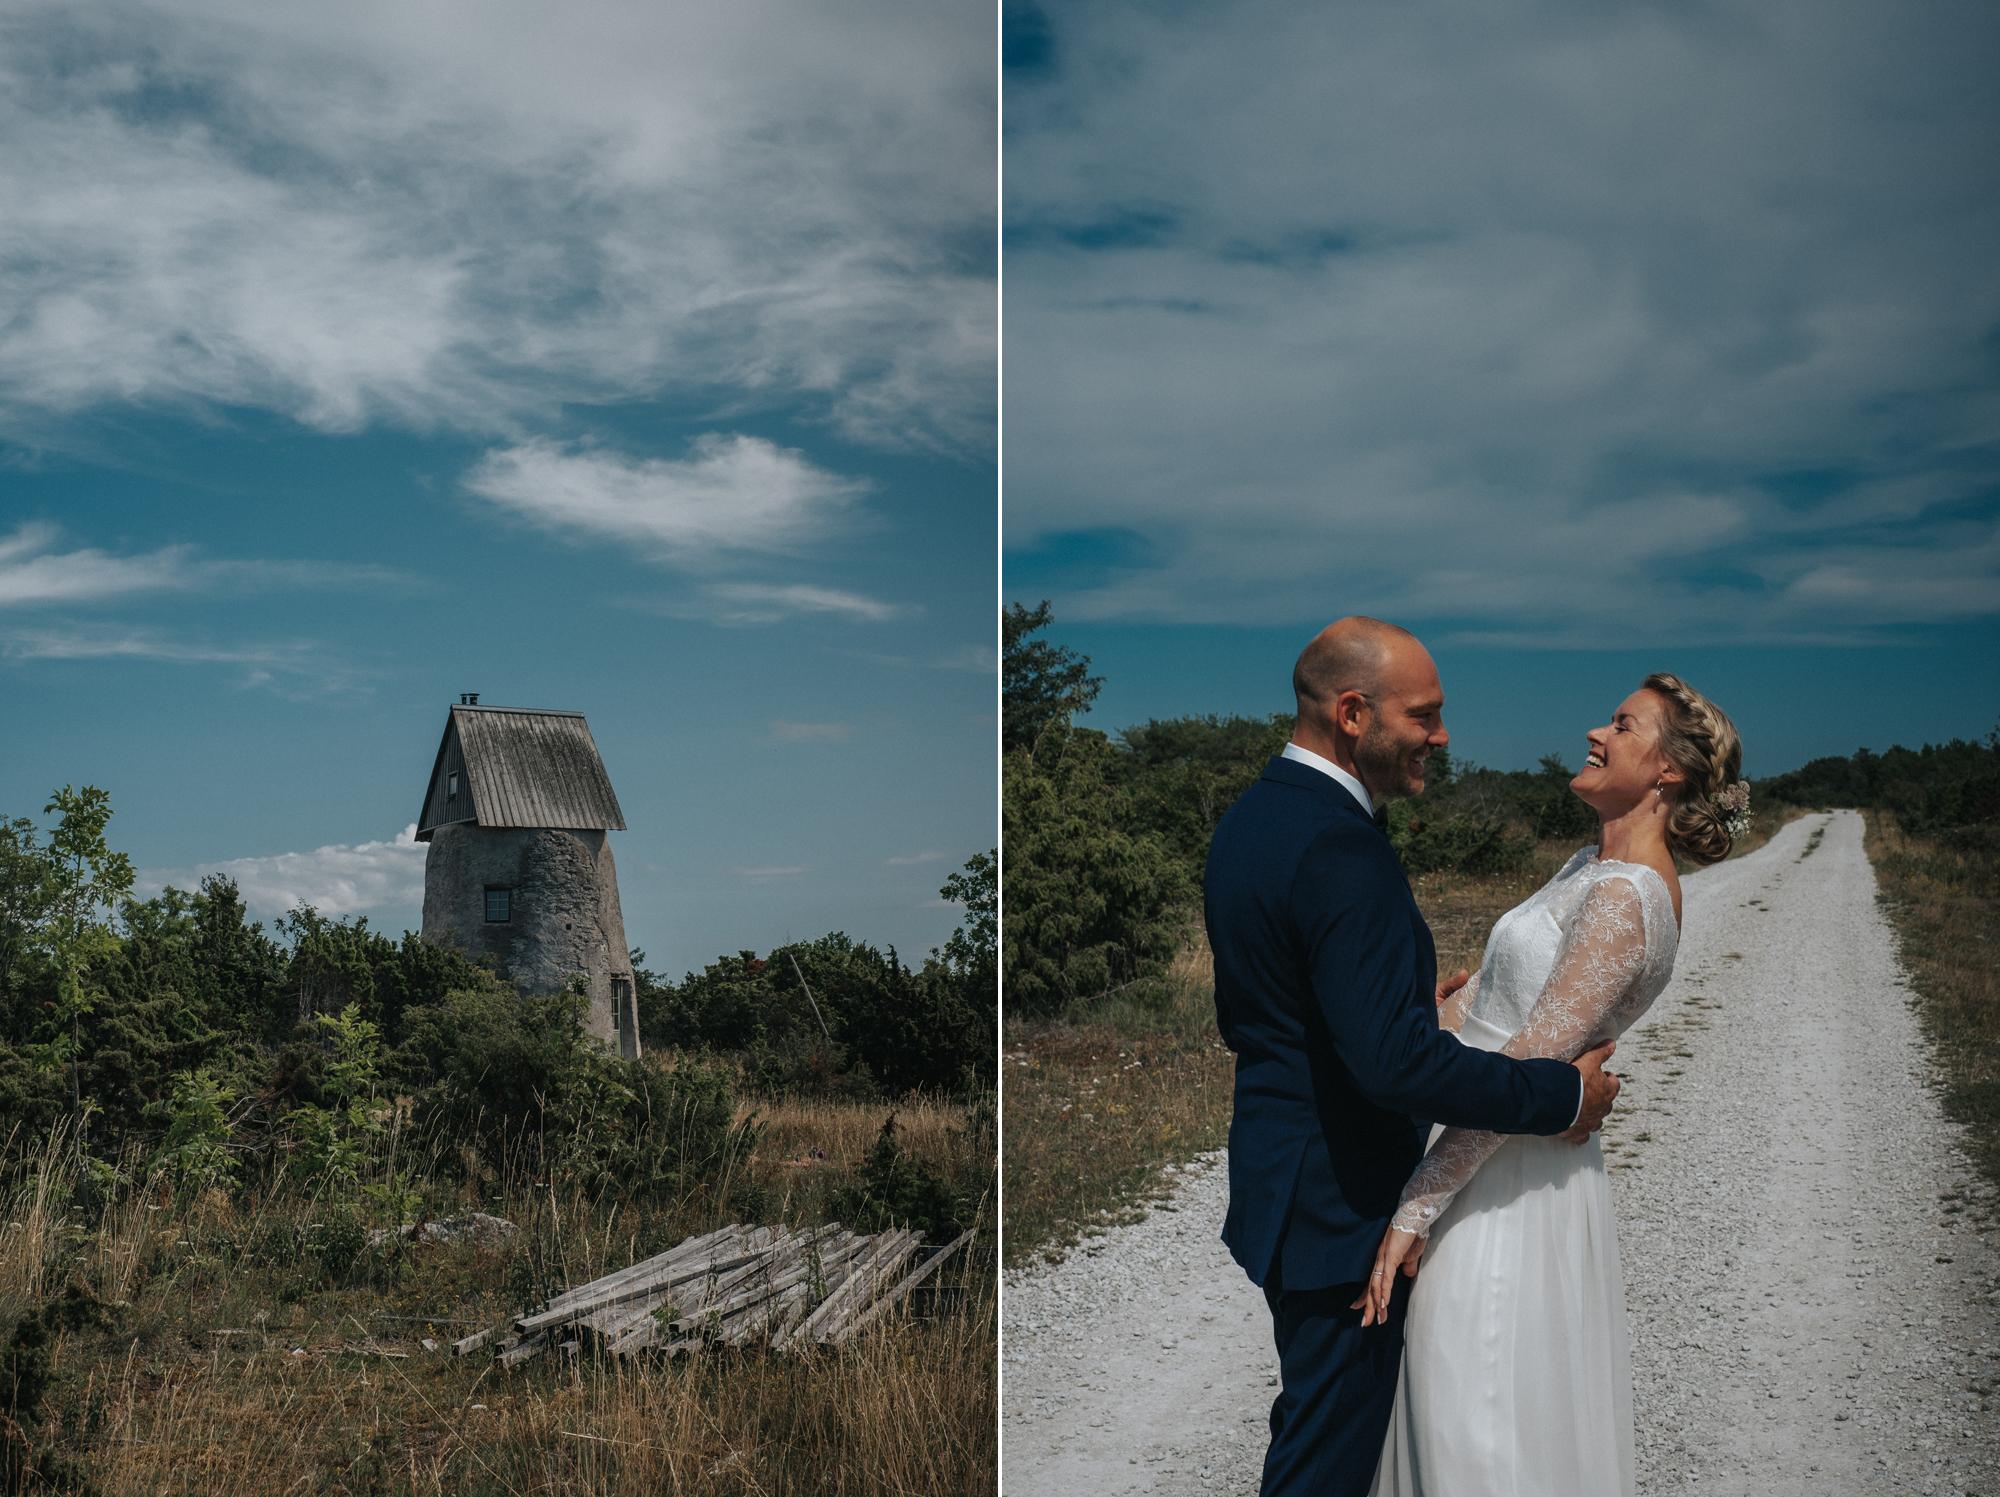 004-bröllopsfotograf-fårö-neas-fotografi.jpg